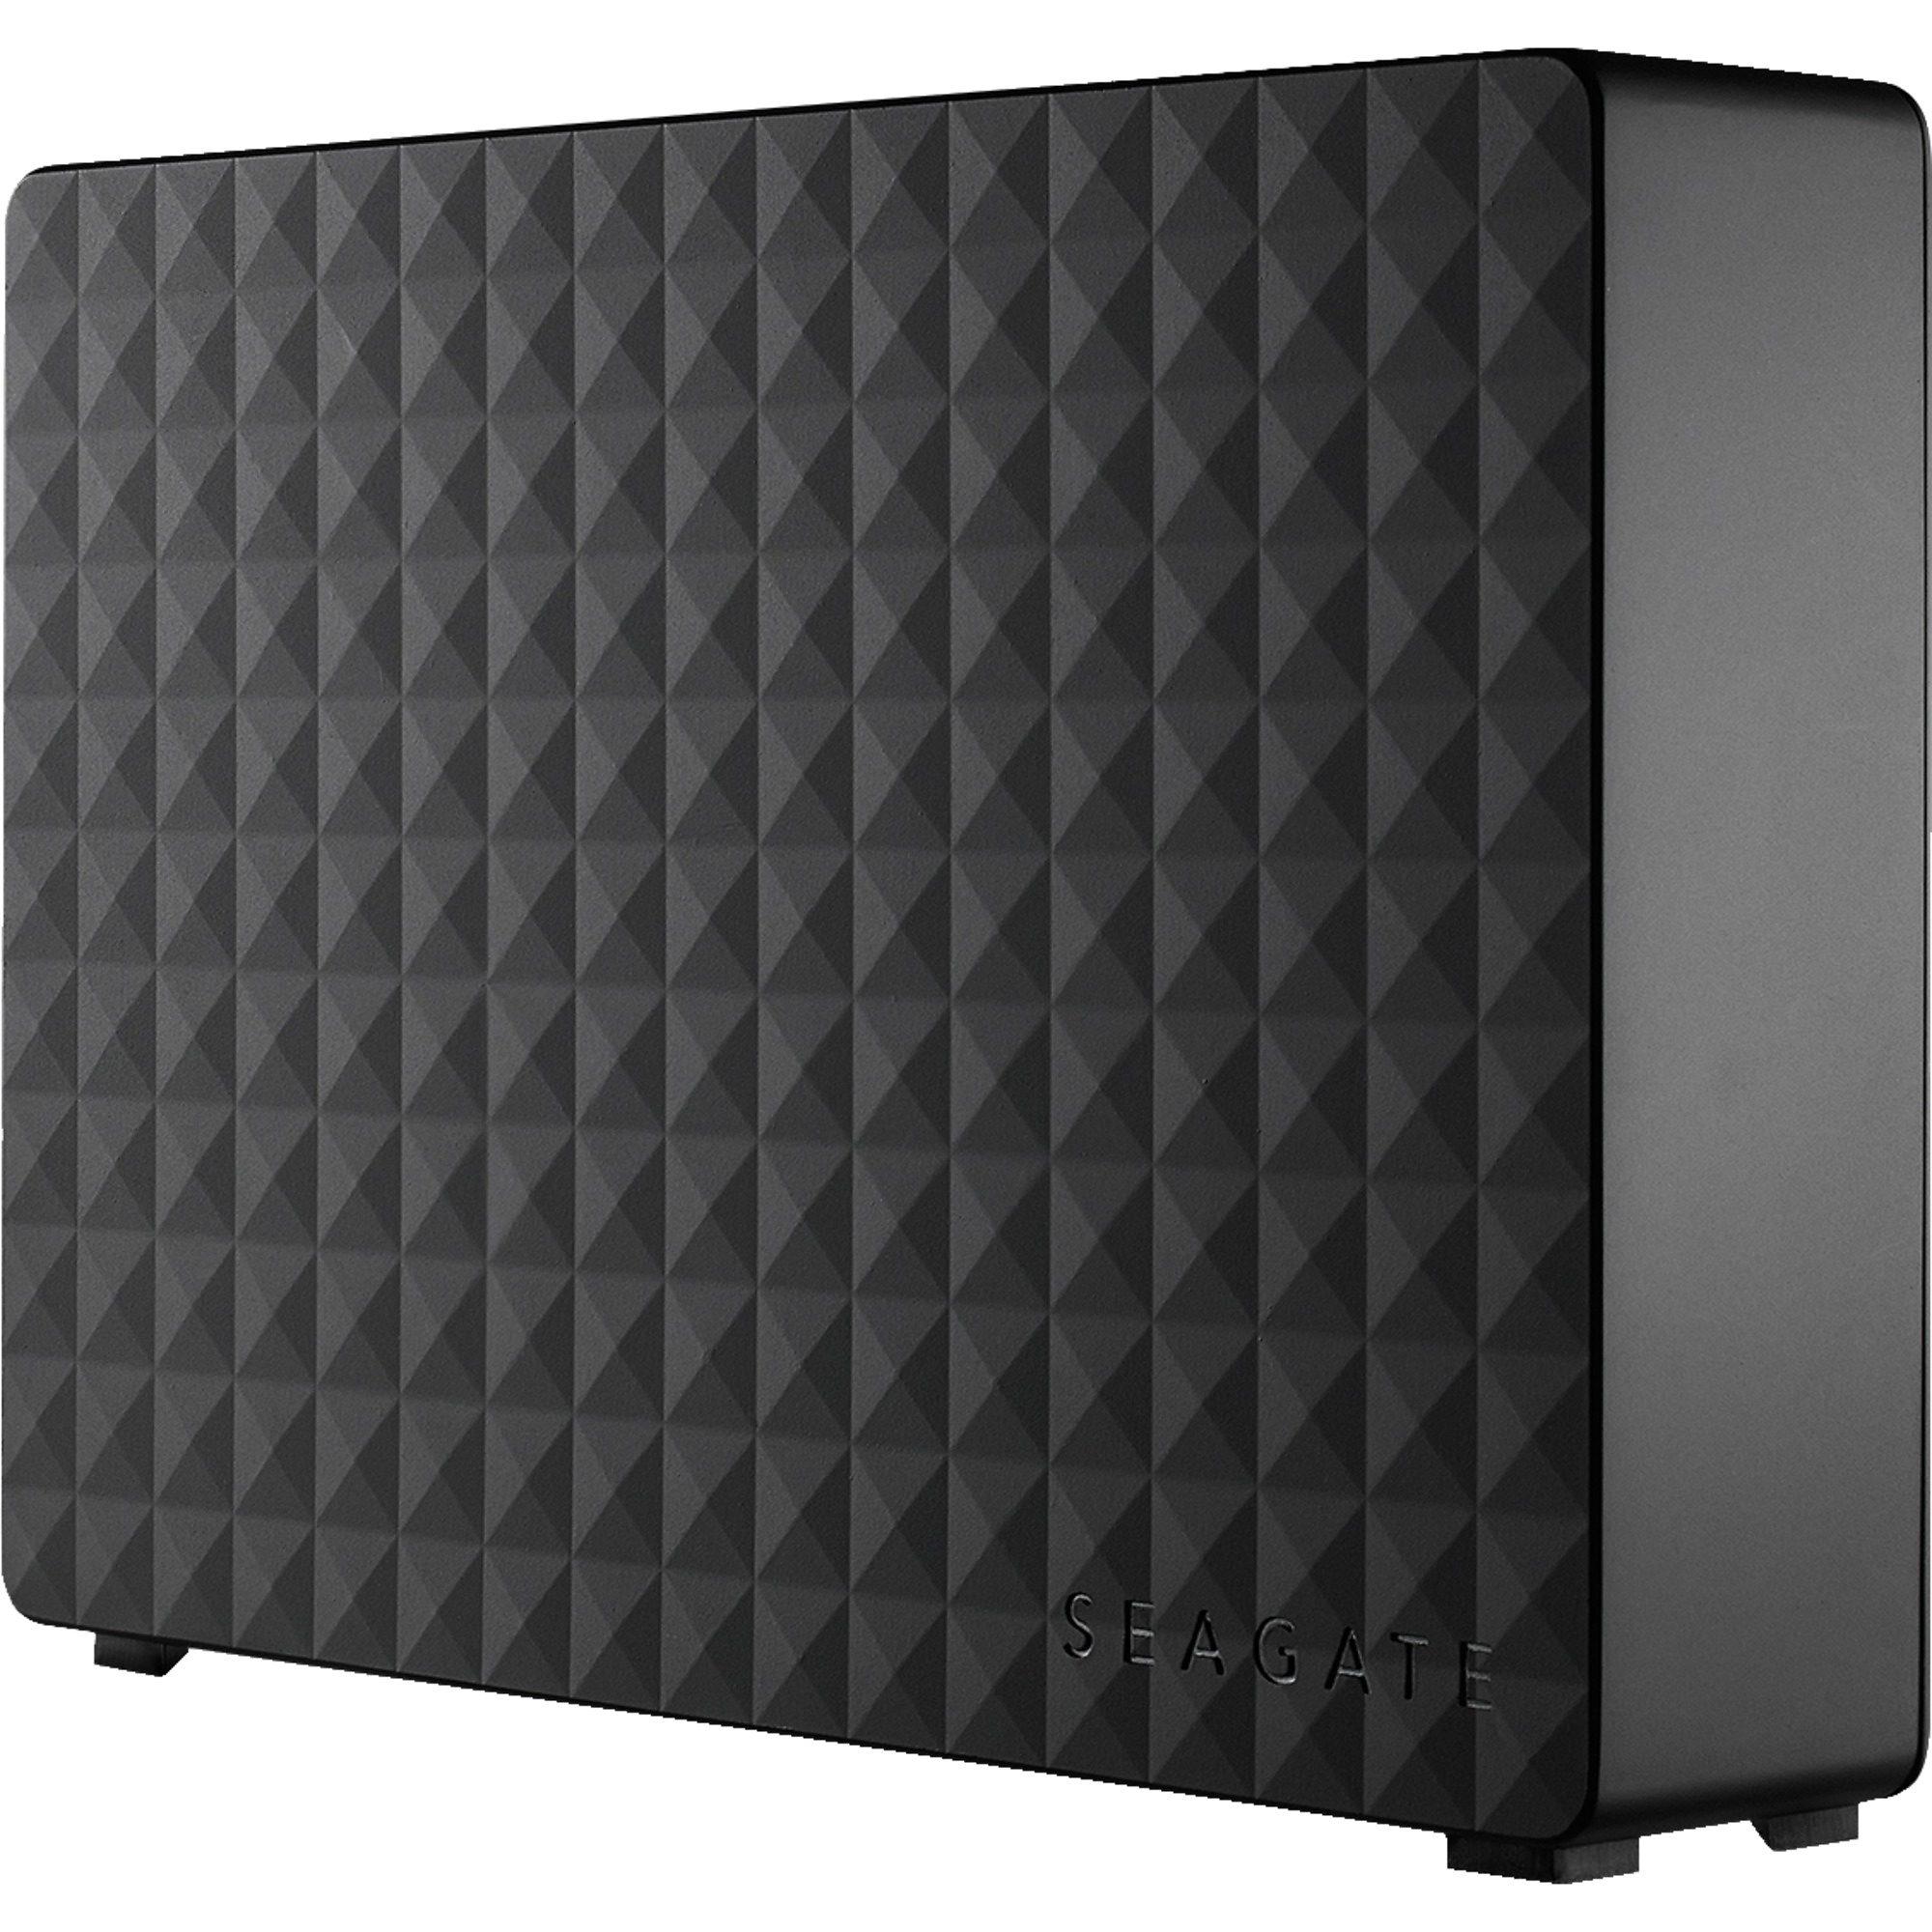 Seagate Festplatte »Expansion Desktop 4 TB«